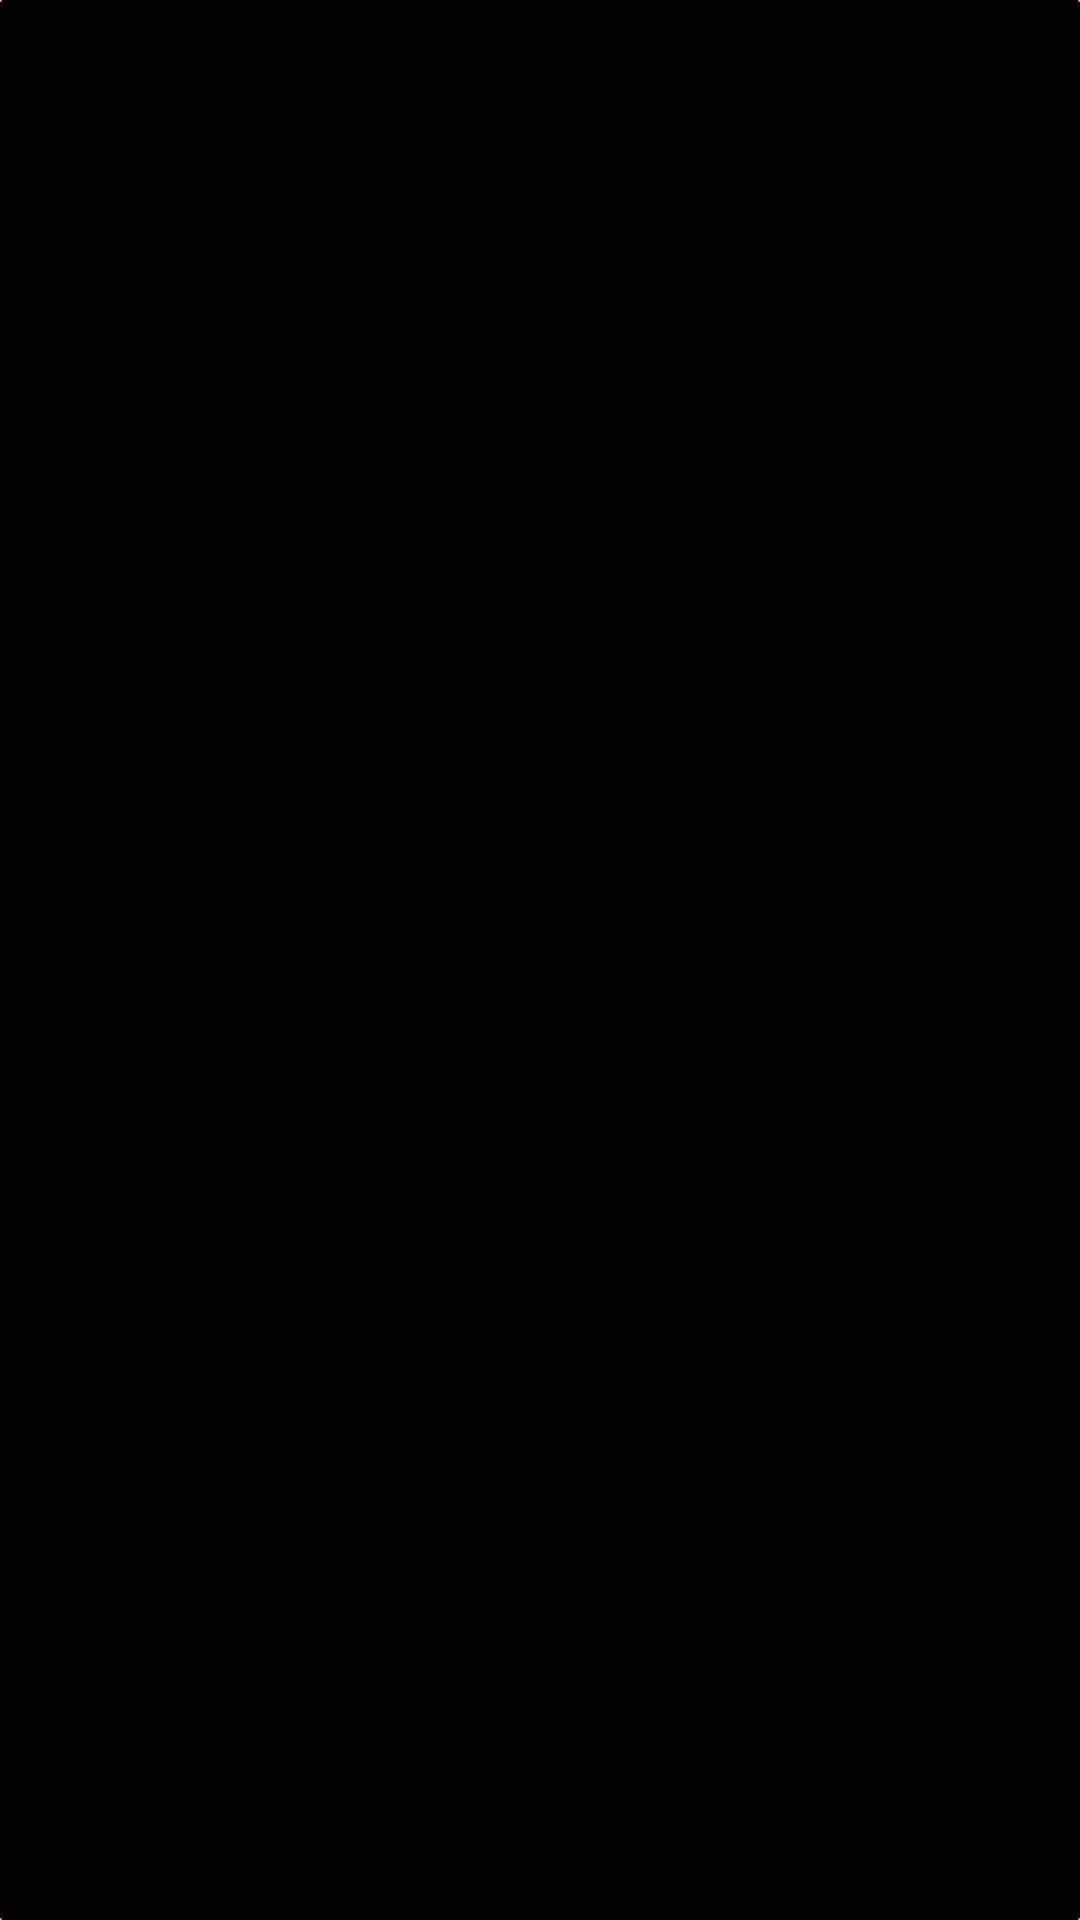 1080X1920 Wallpaper Black HD Wallpapers